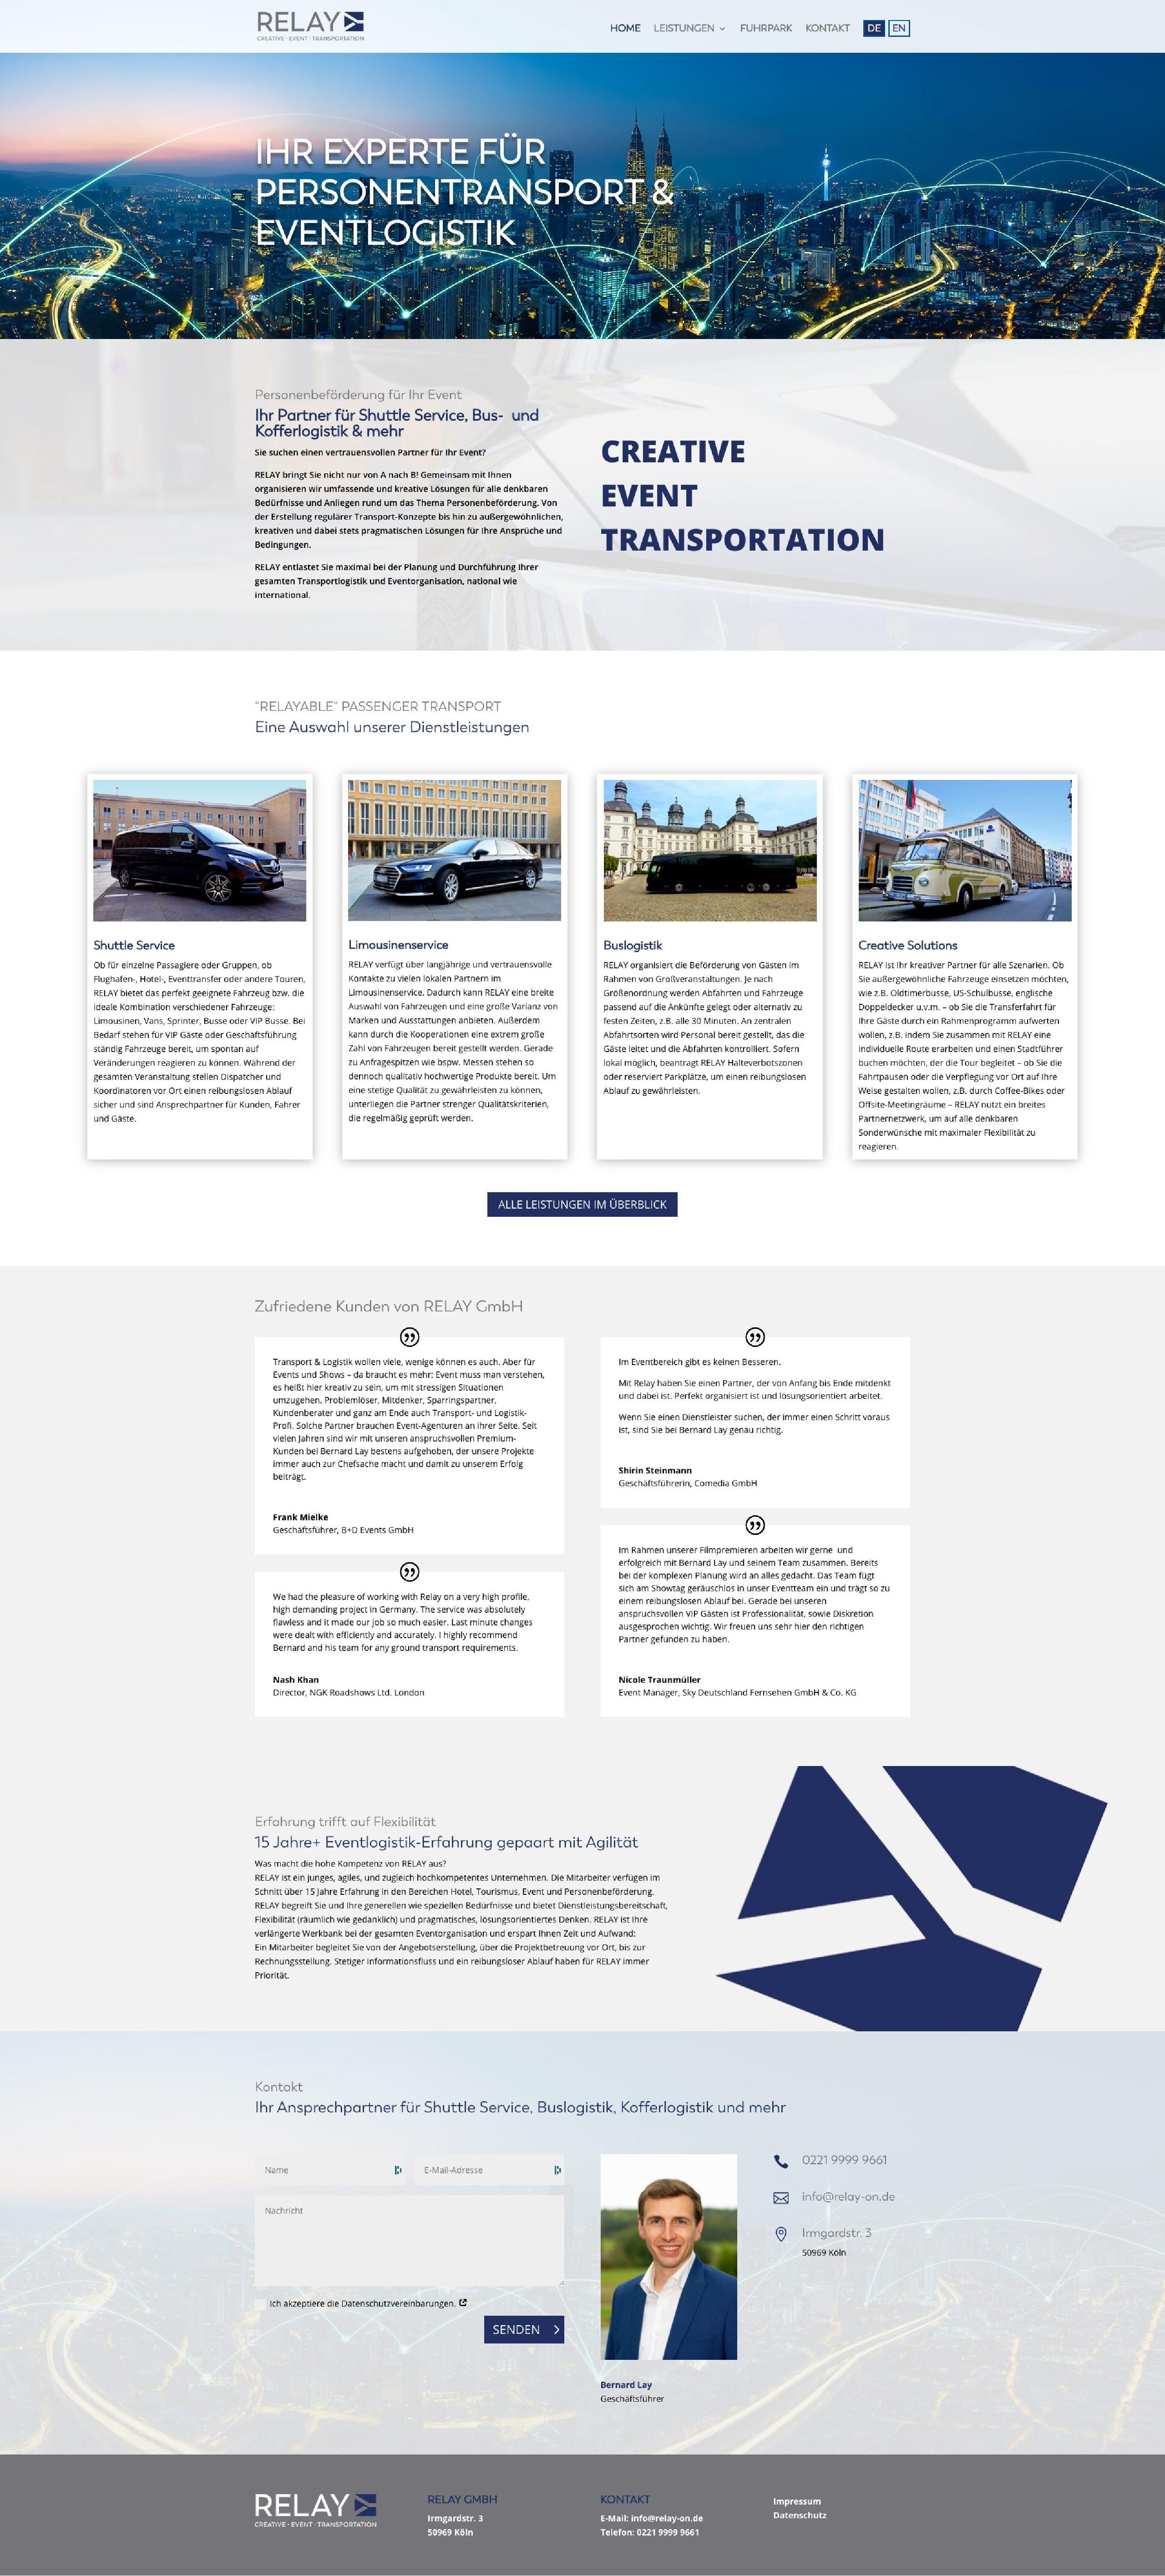 Relay GmbH Website